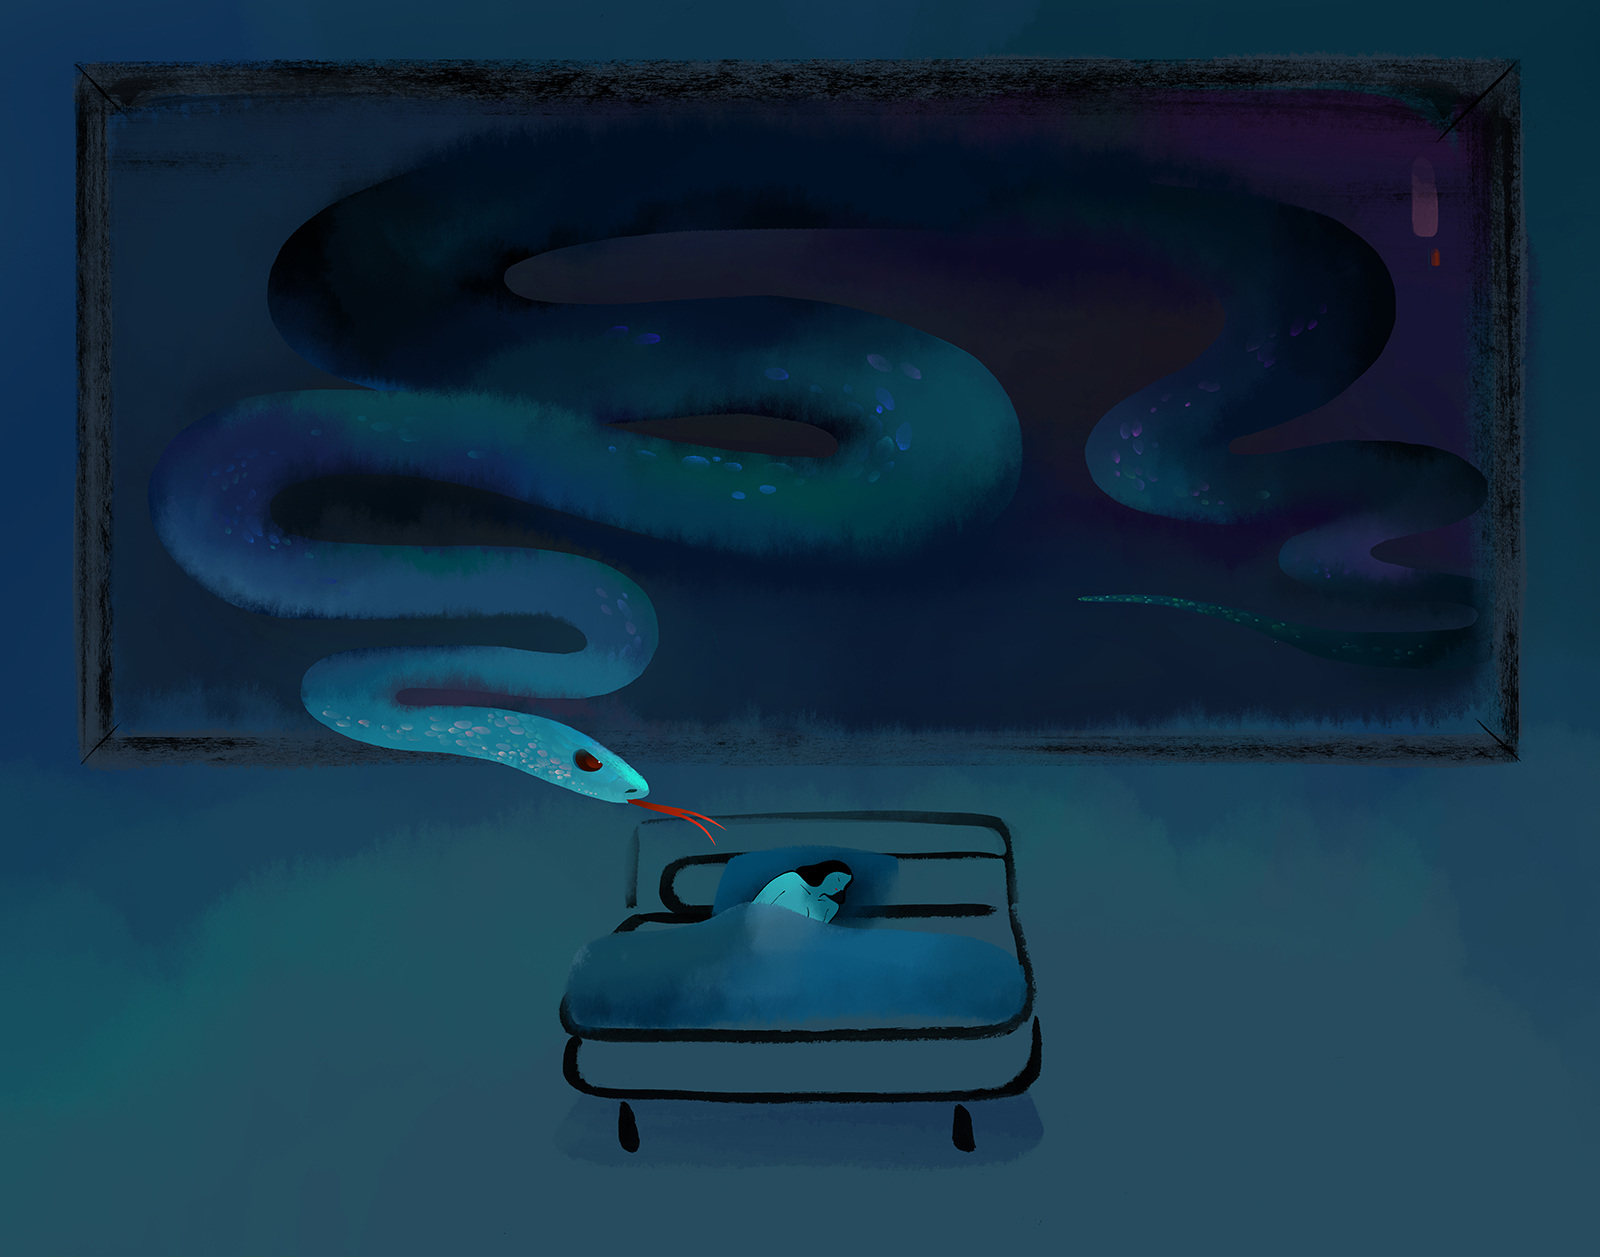 bad dreams tianhua mao illustrator